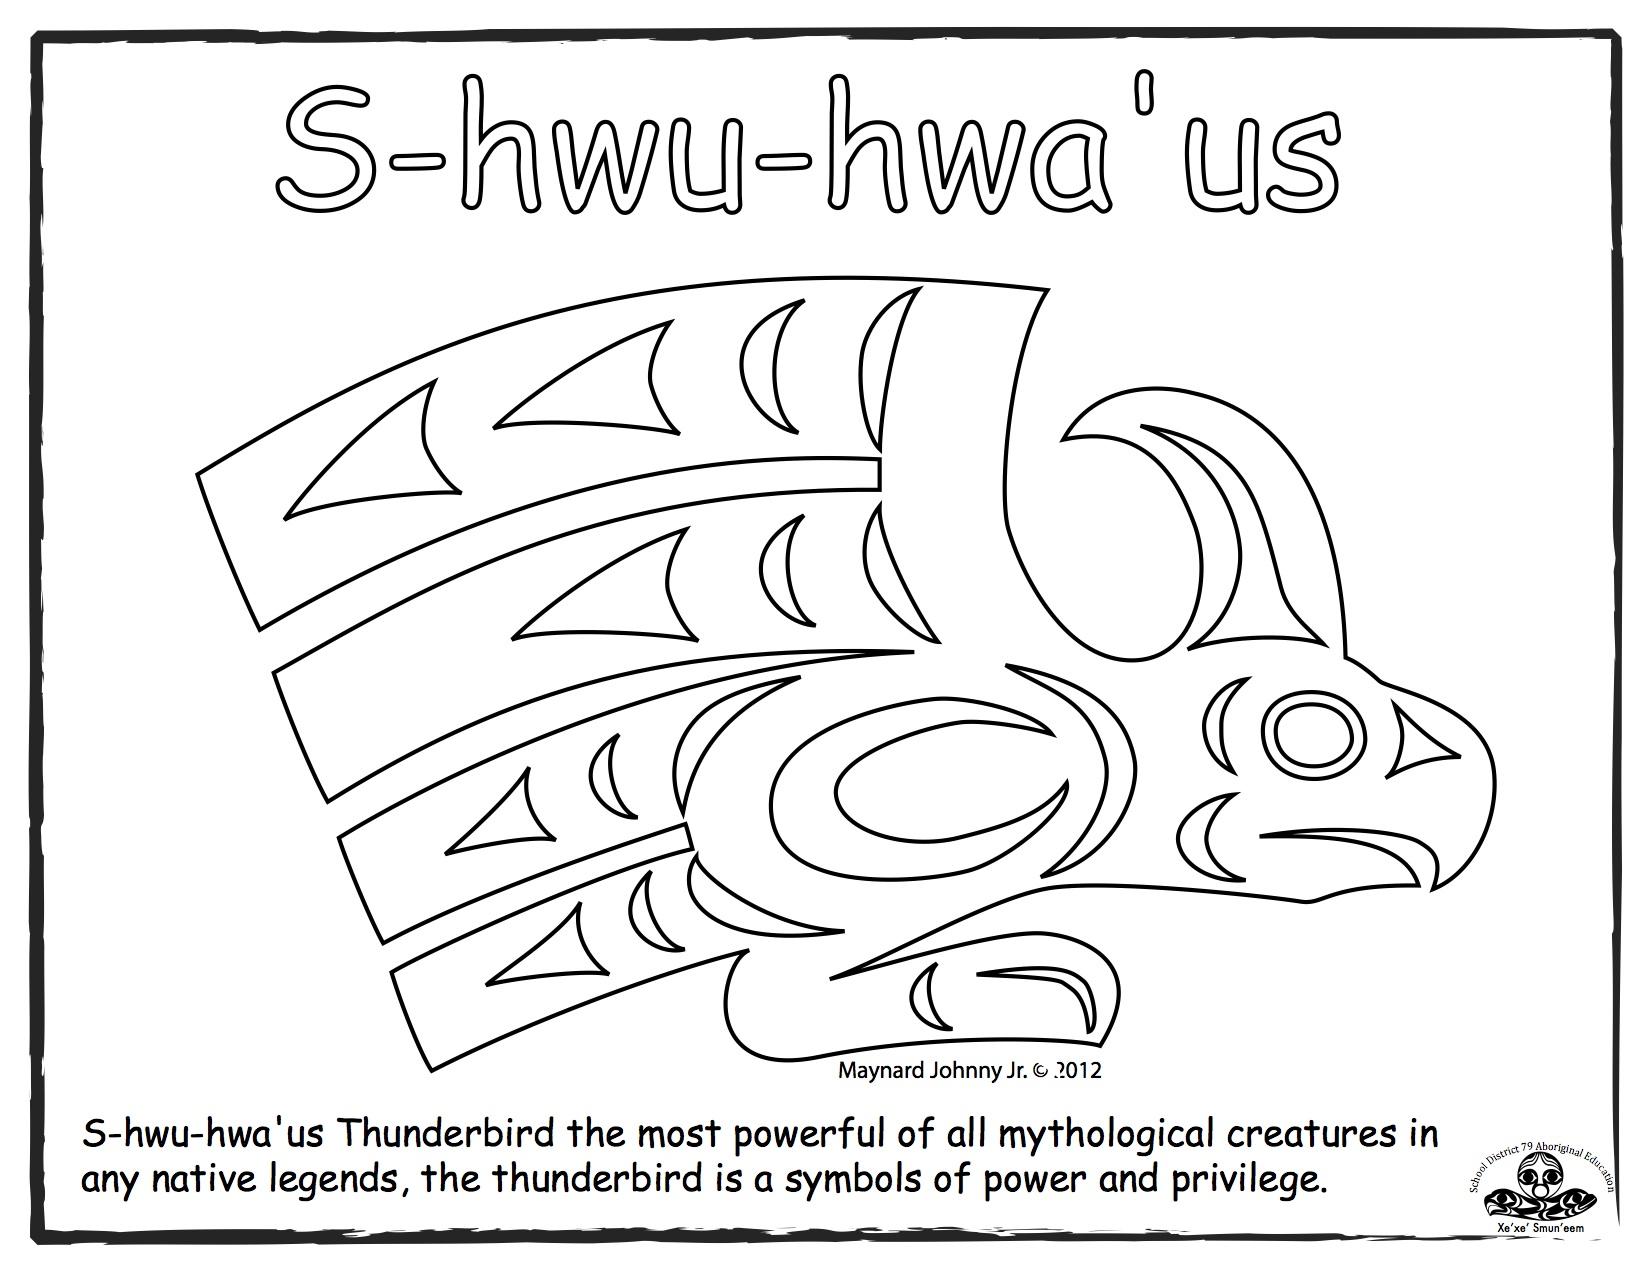 thunderbird-s-hwu-hwaus-outline